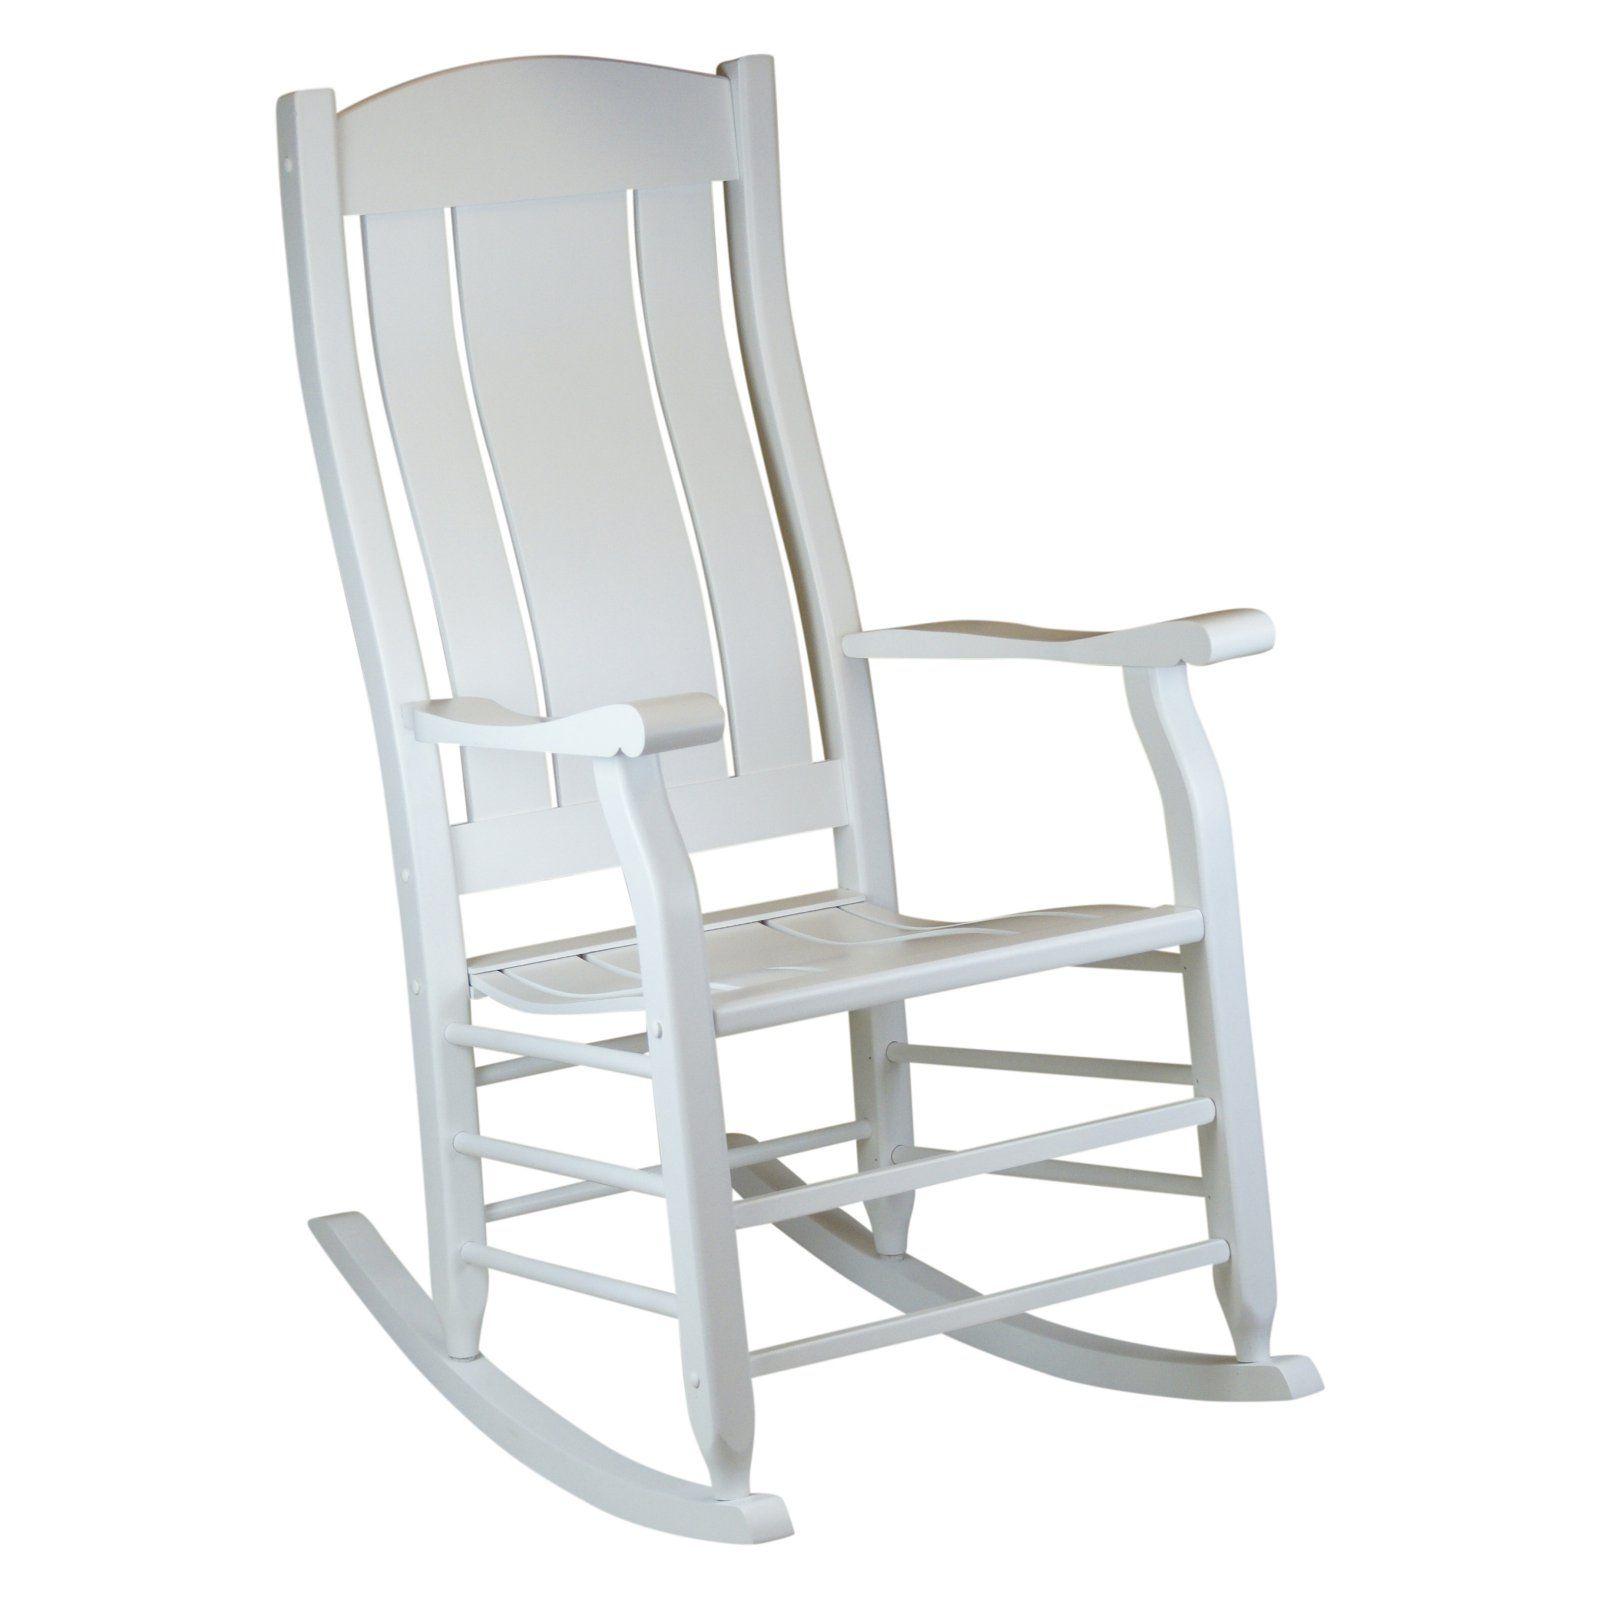 Strange Outdoor Hinkle Carrington Slat Back Wood Patio Rocking Chair Theyellowbook Wood Chair Design Ideas Theyellowbookinfo